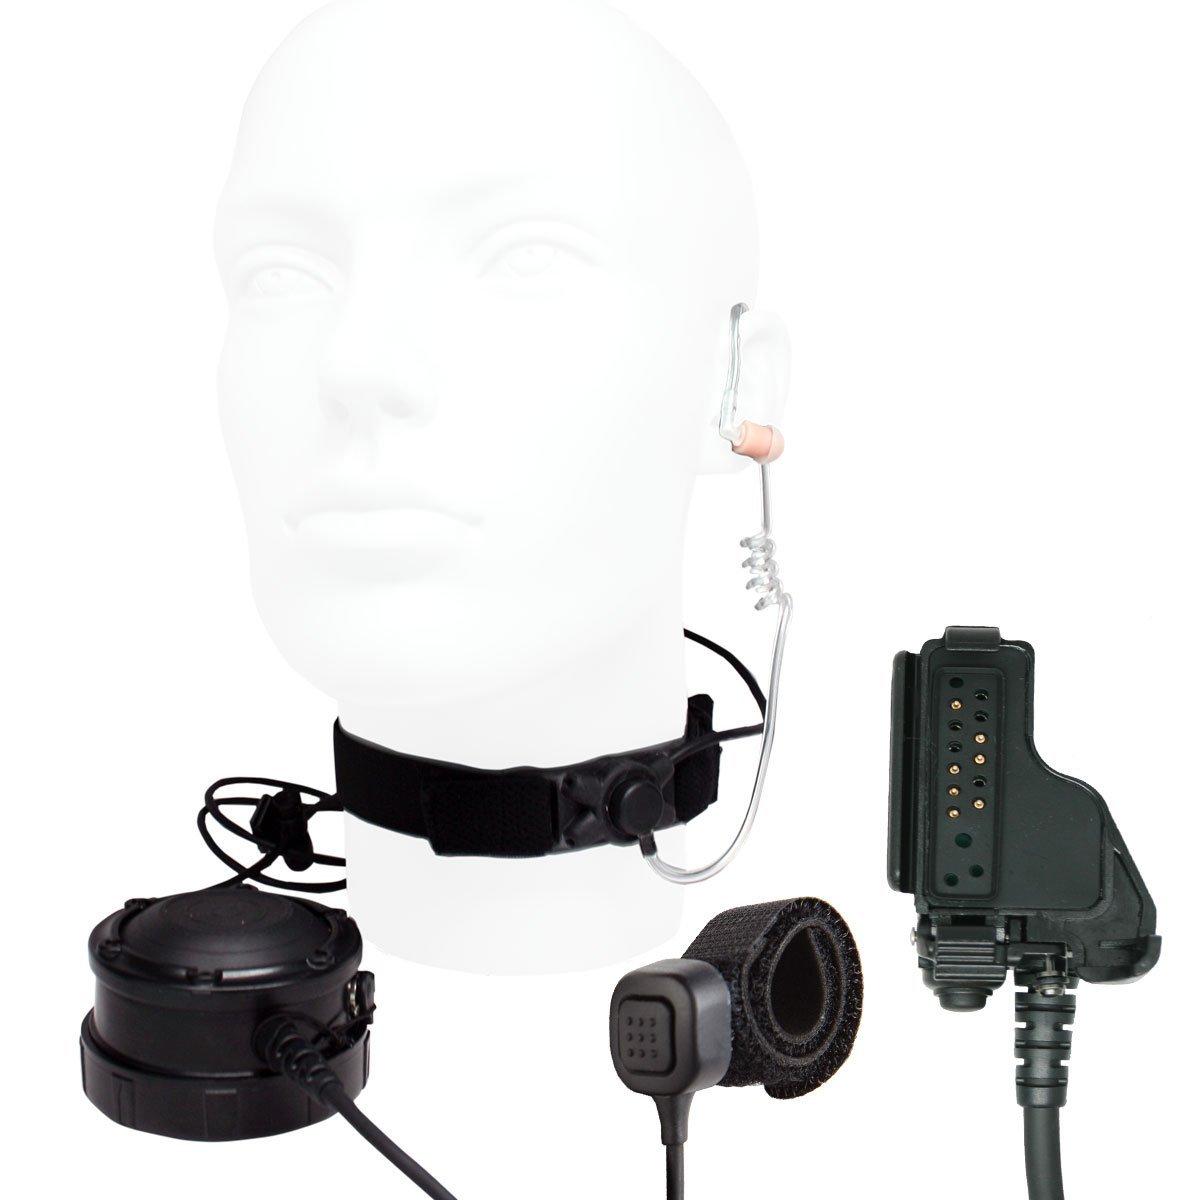 ARC Neck Strap Tactical Throat Microphone for Motorola Radio XTS1500/2500/3000/3500/5000, MTS2000, HT1000, MT1500/2000, MTX838/8000/9000, PR1500, JT1000, MTX-LS